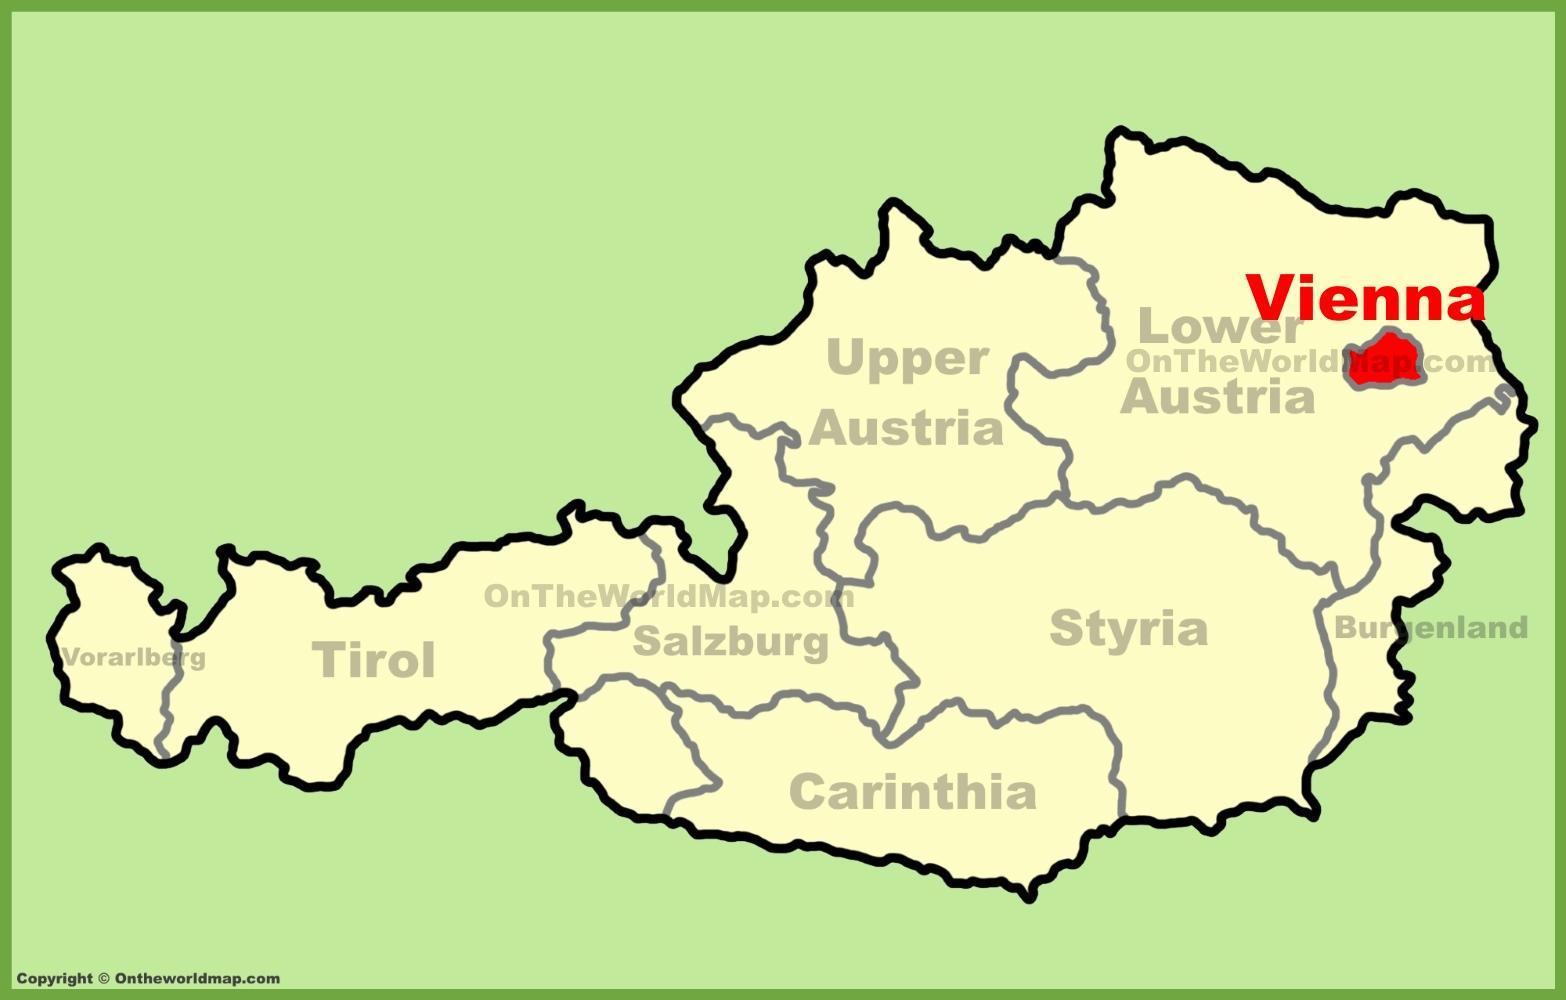 viena de austria mapa Viena, Austria mapa   Wien Austria map (Austria) viena de austria mapa